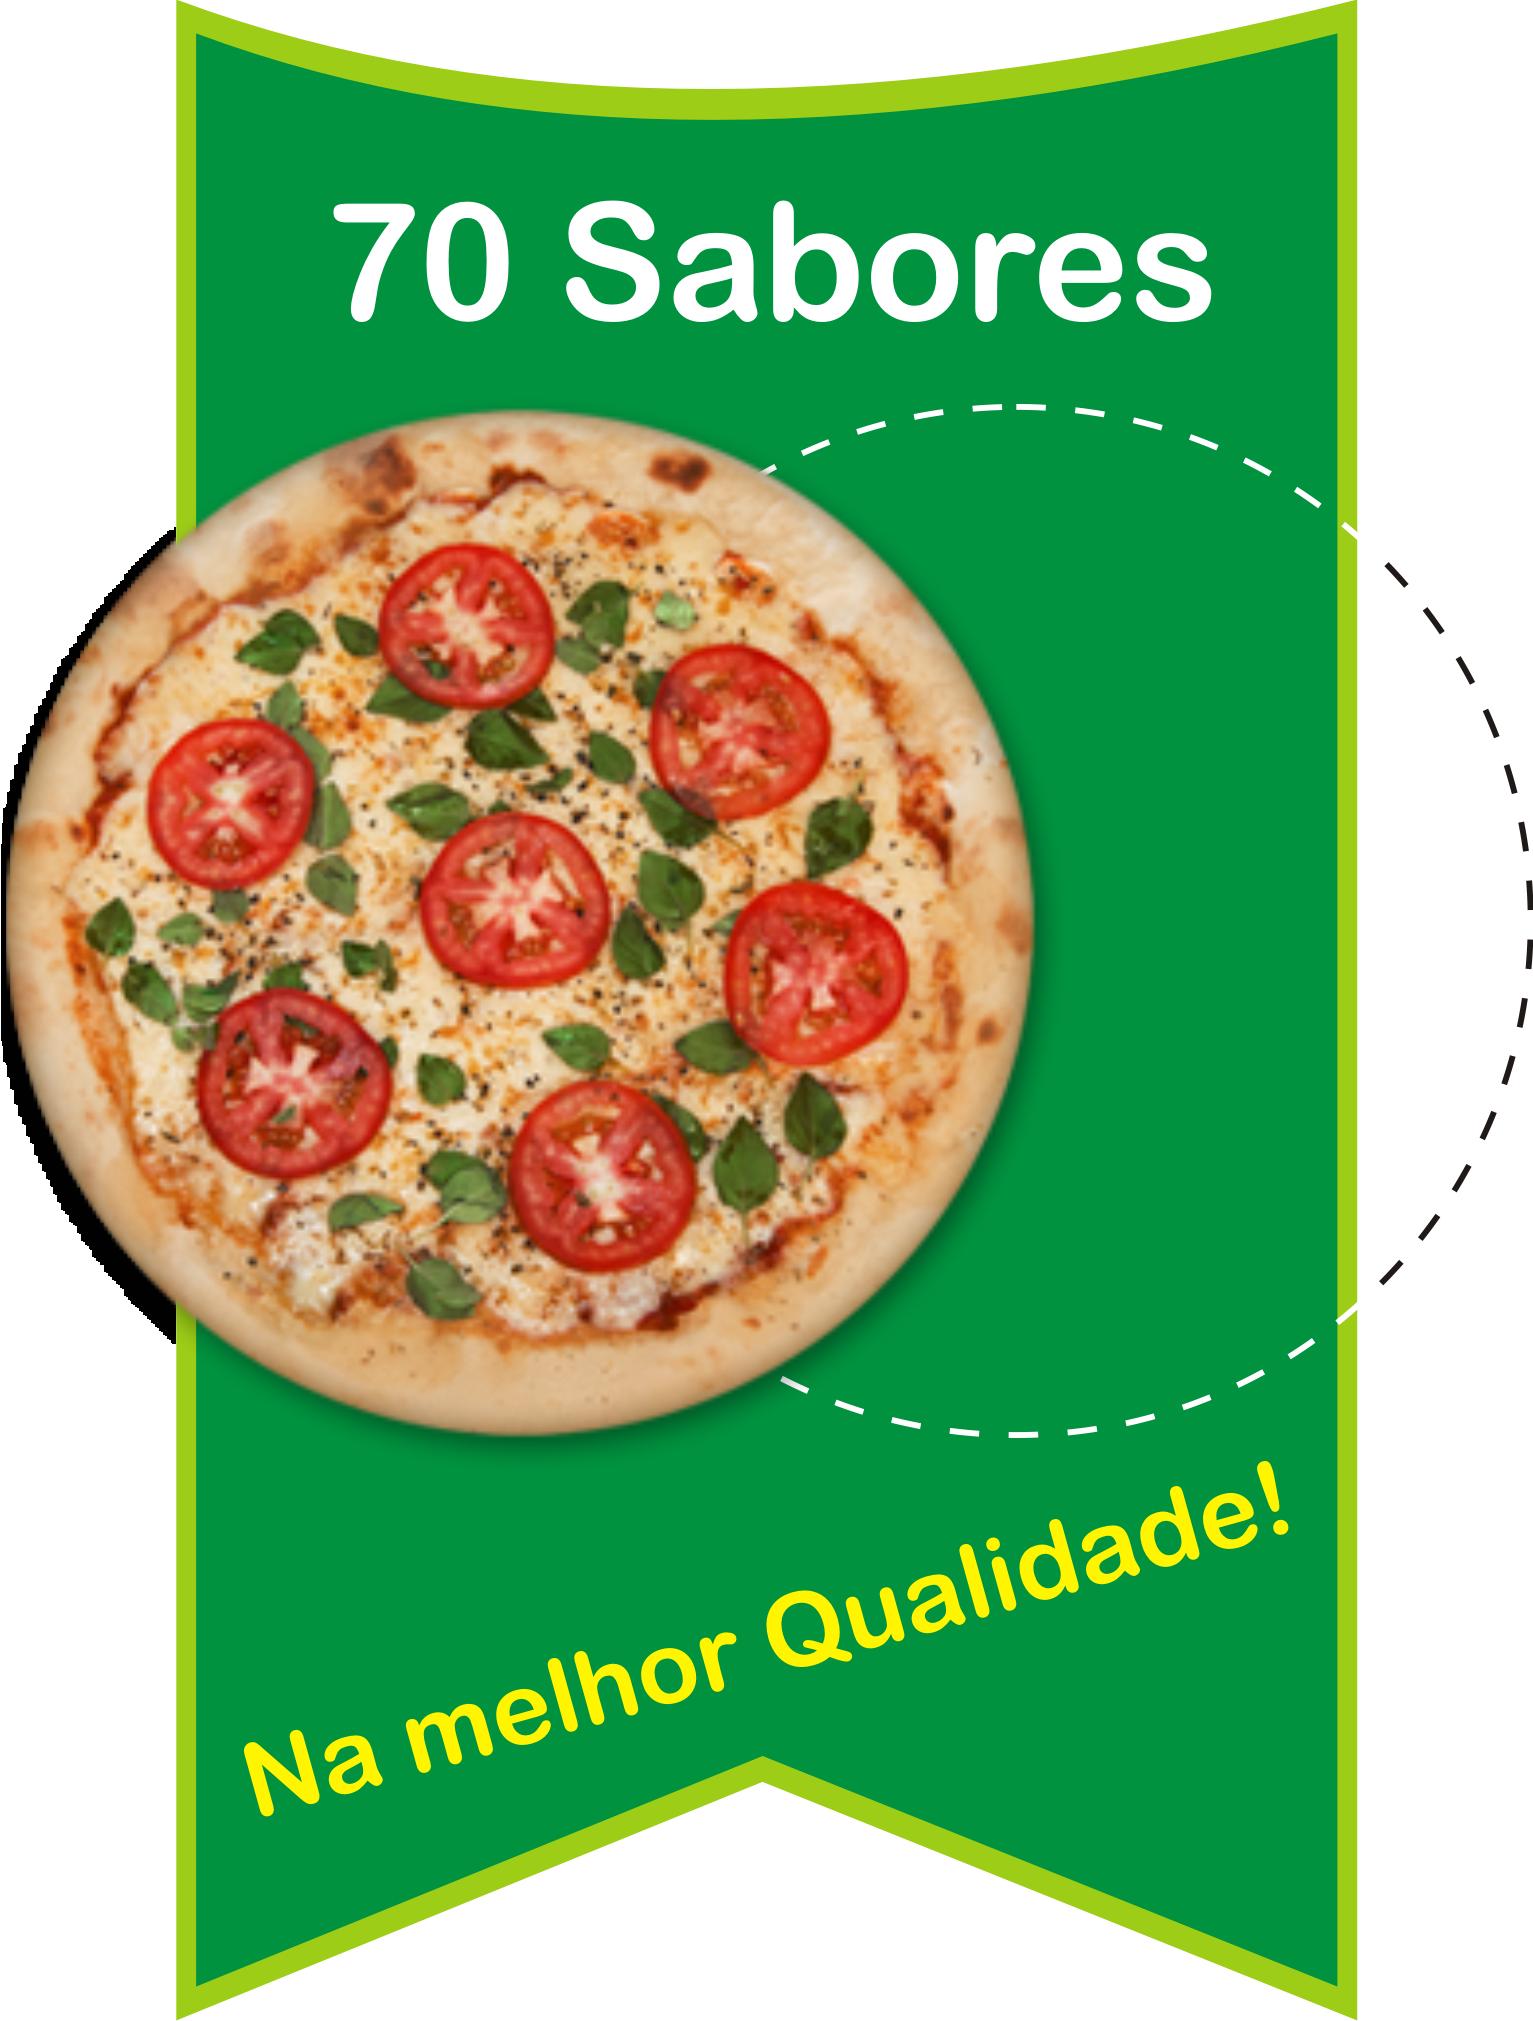 sabores_pizzas 2